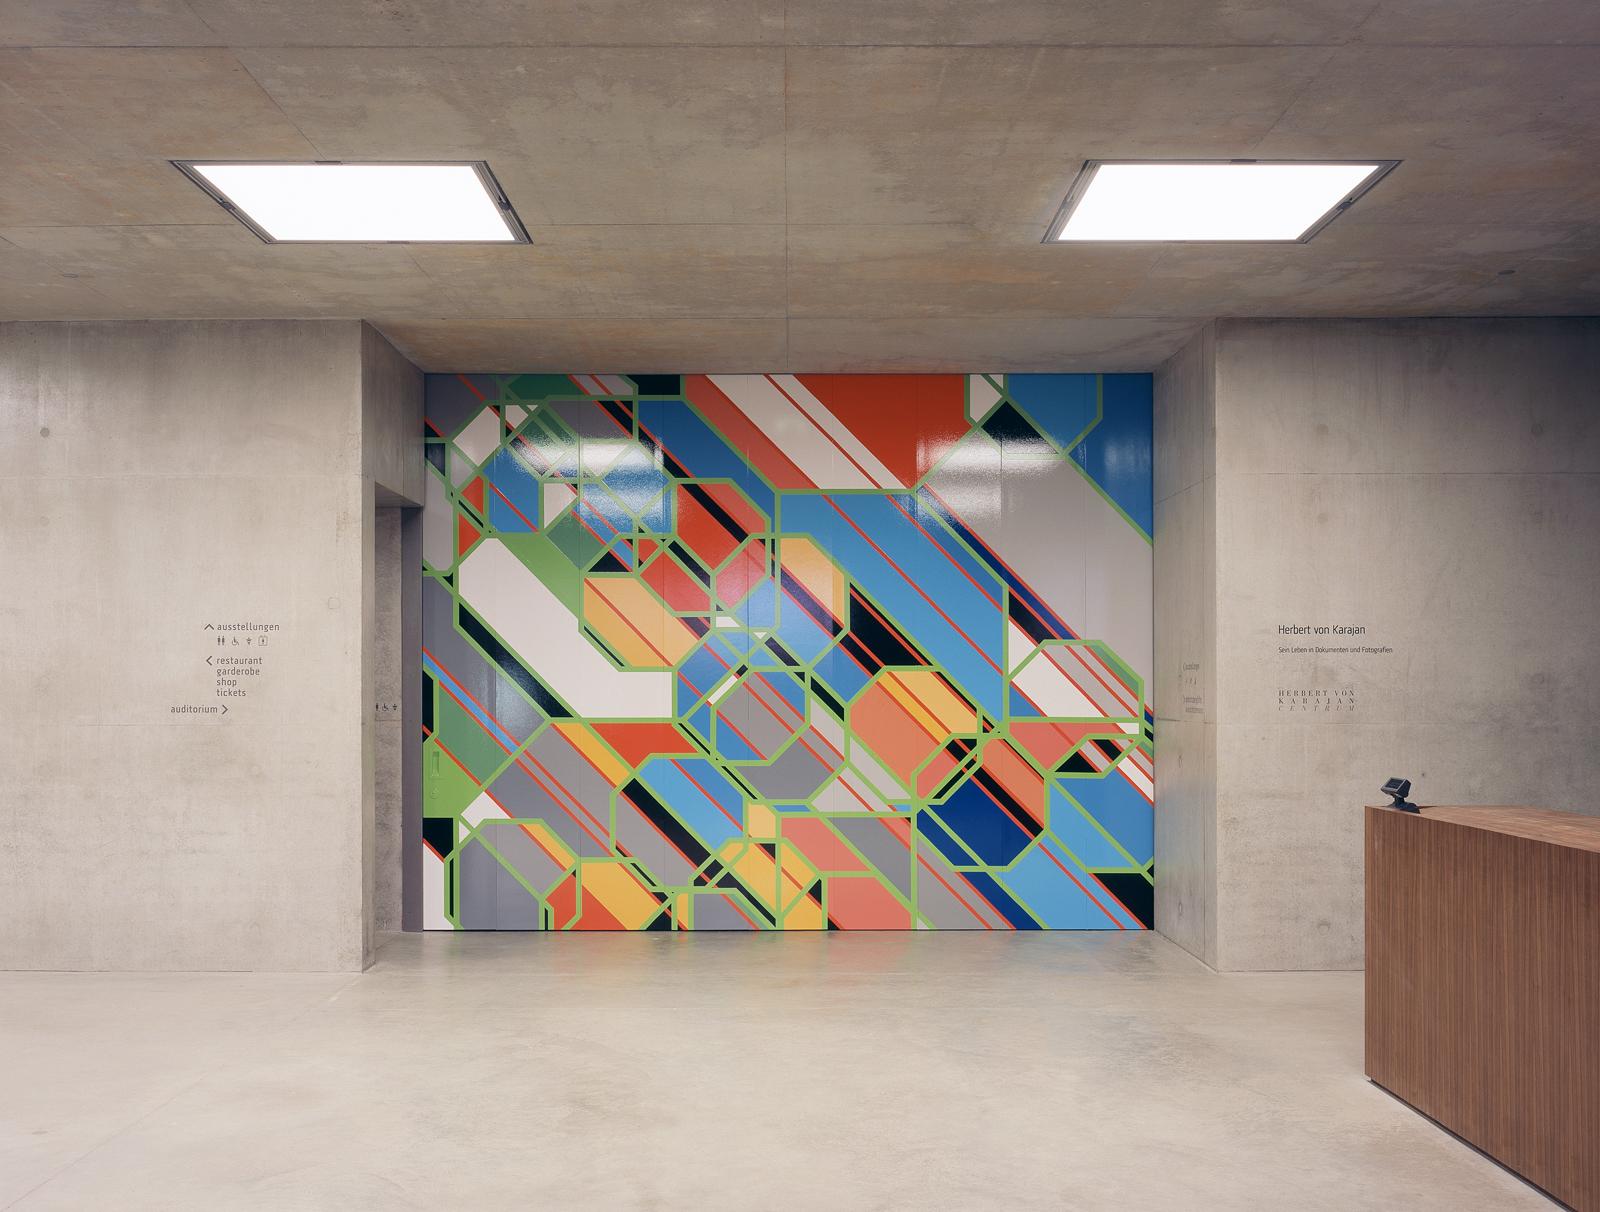 Foyer mit Kunst am Bau |Torbemalung Sarah Morris, NY